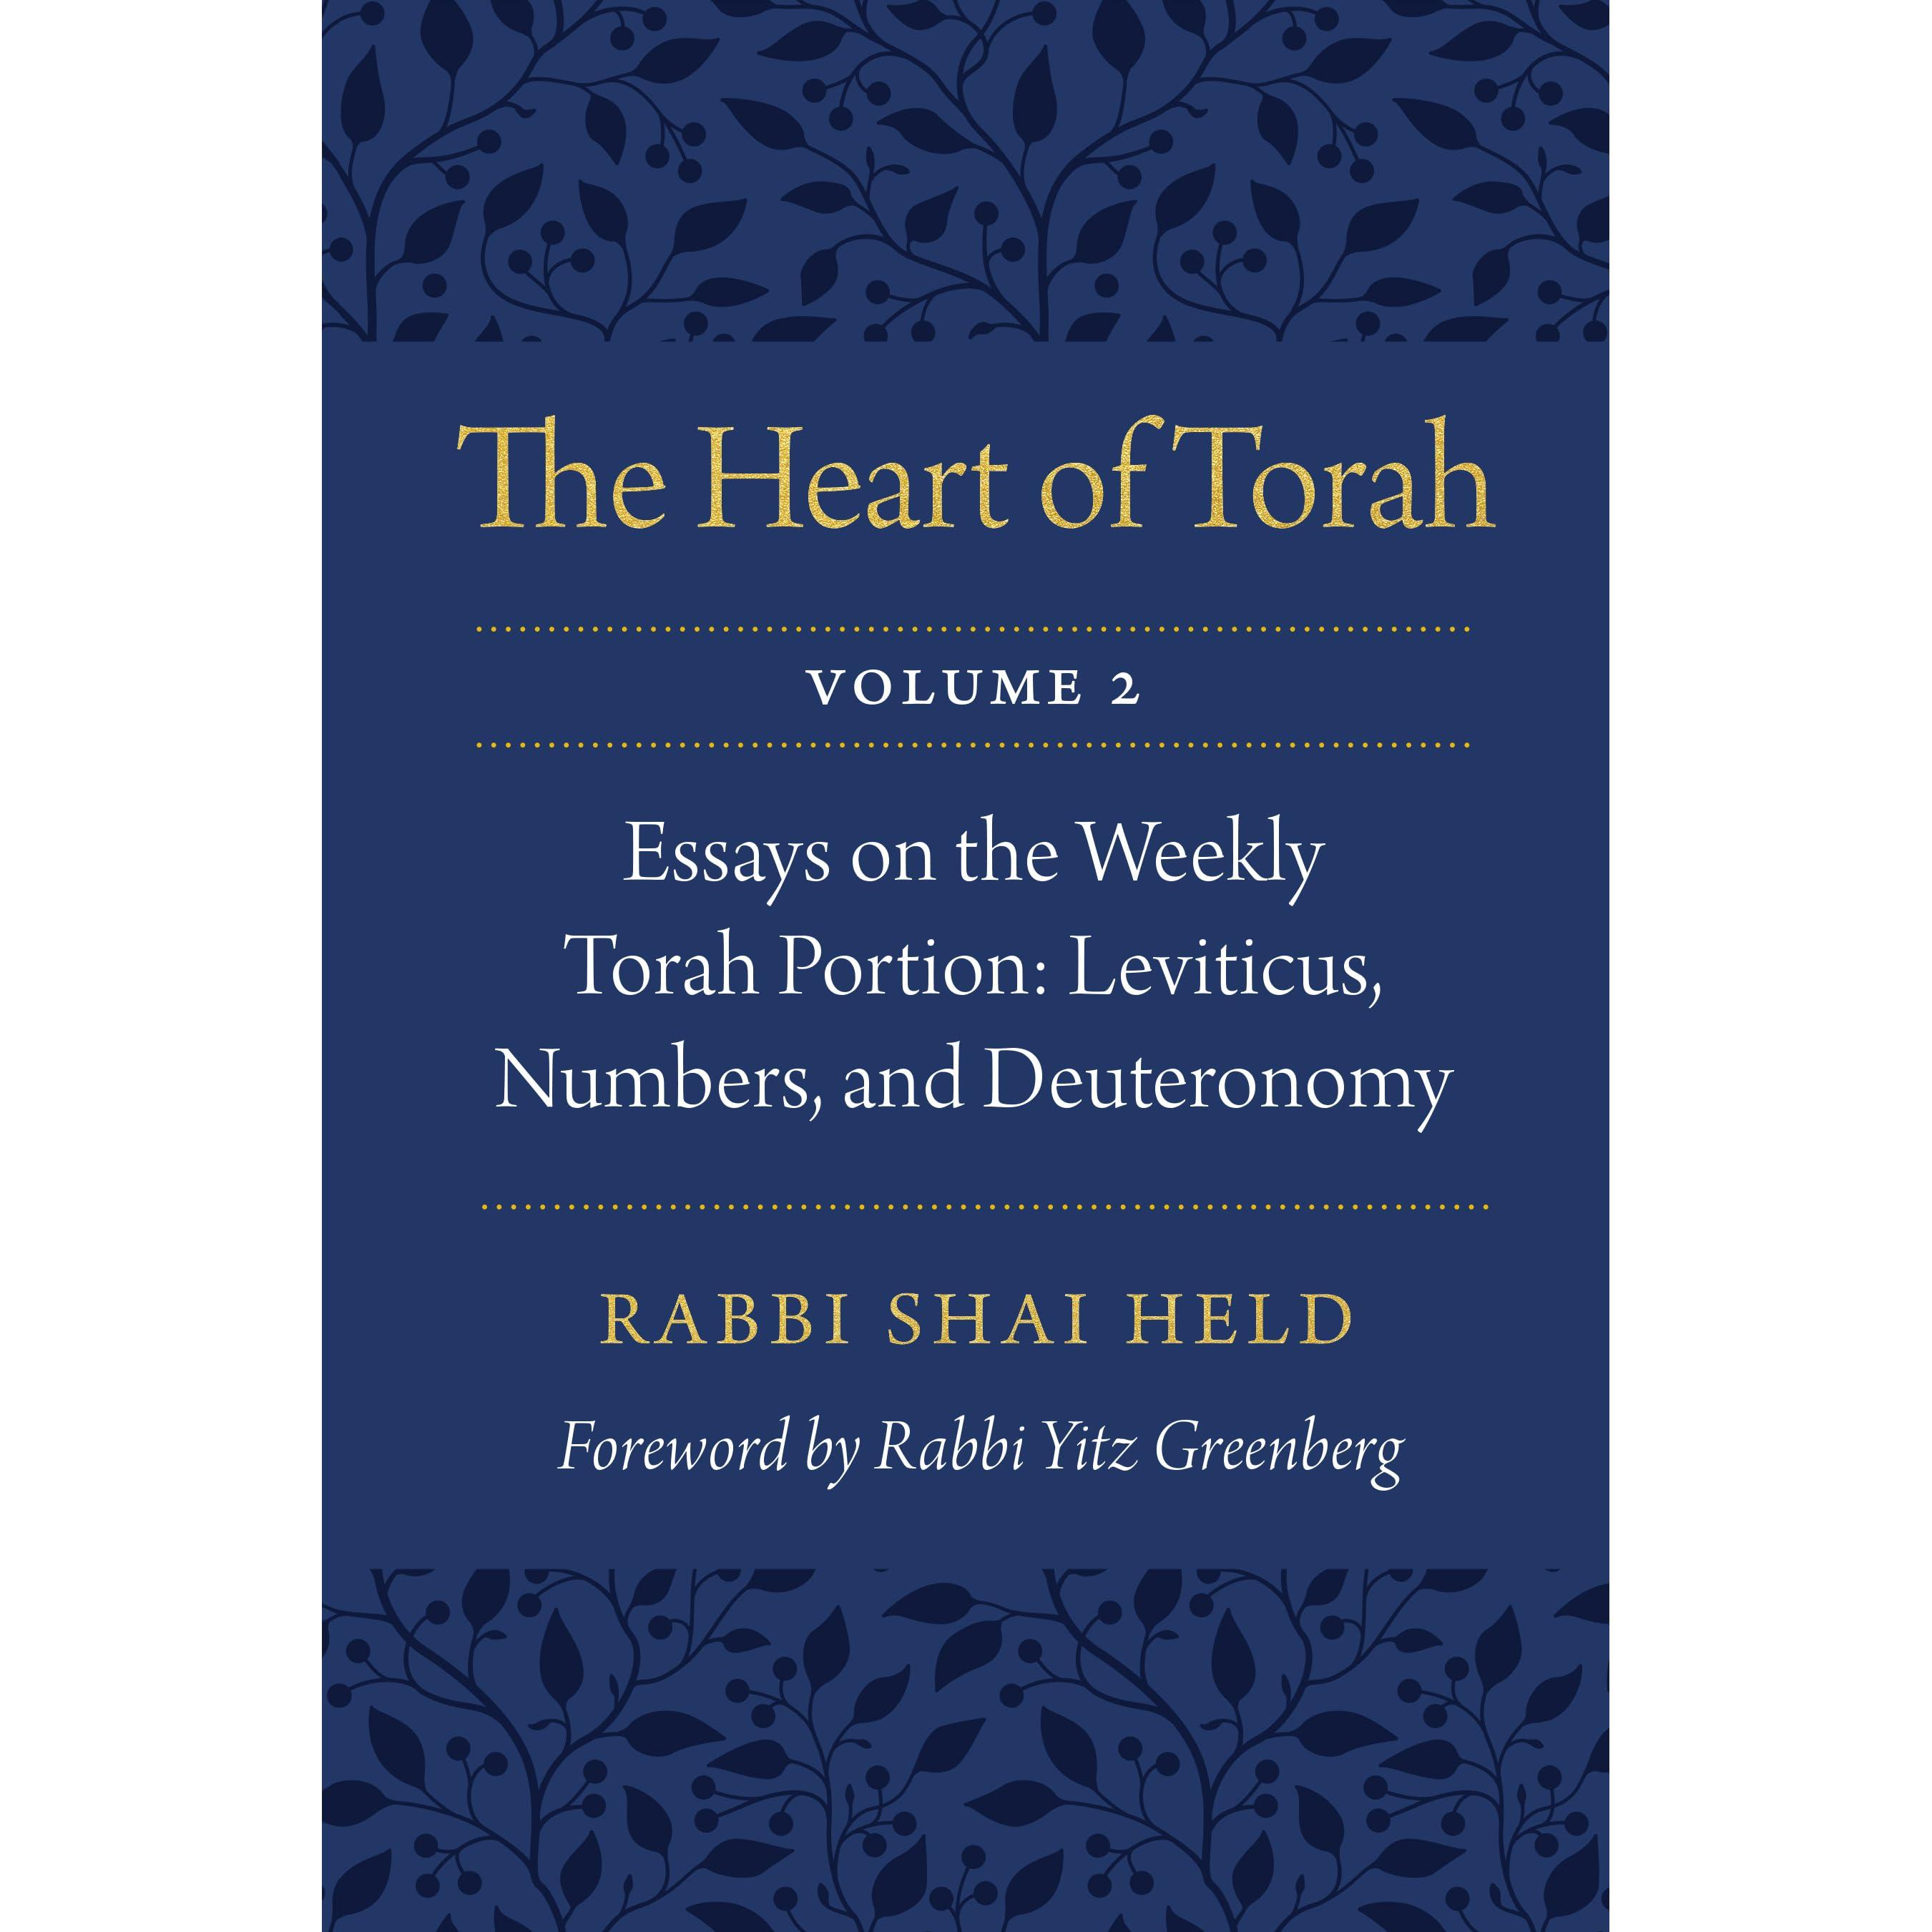 The Heart of Torah, Volume 2: Essays on the Weekly Torah